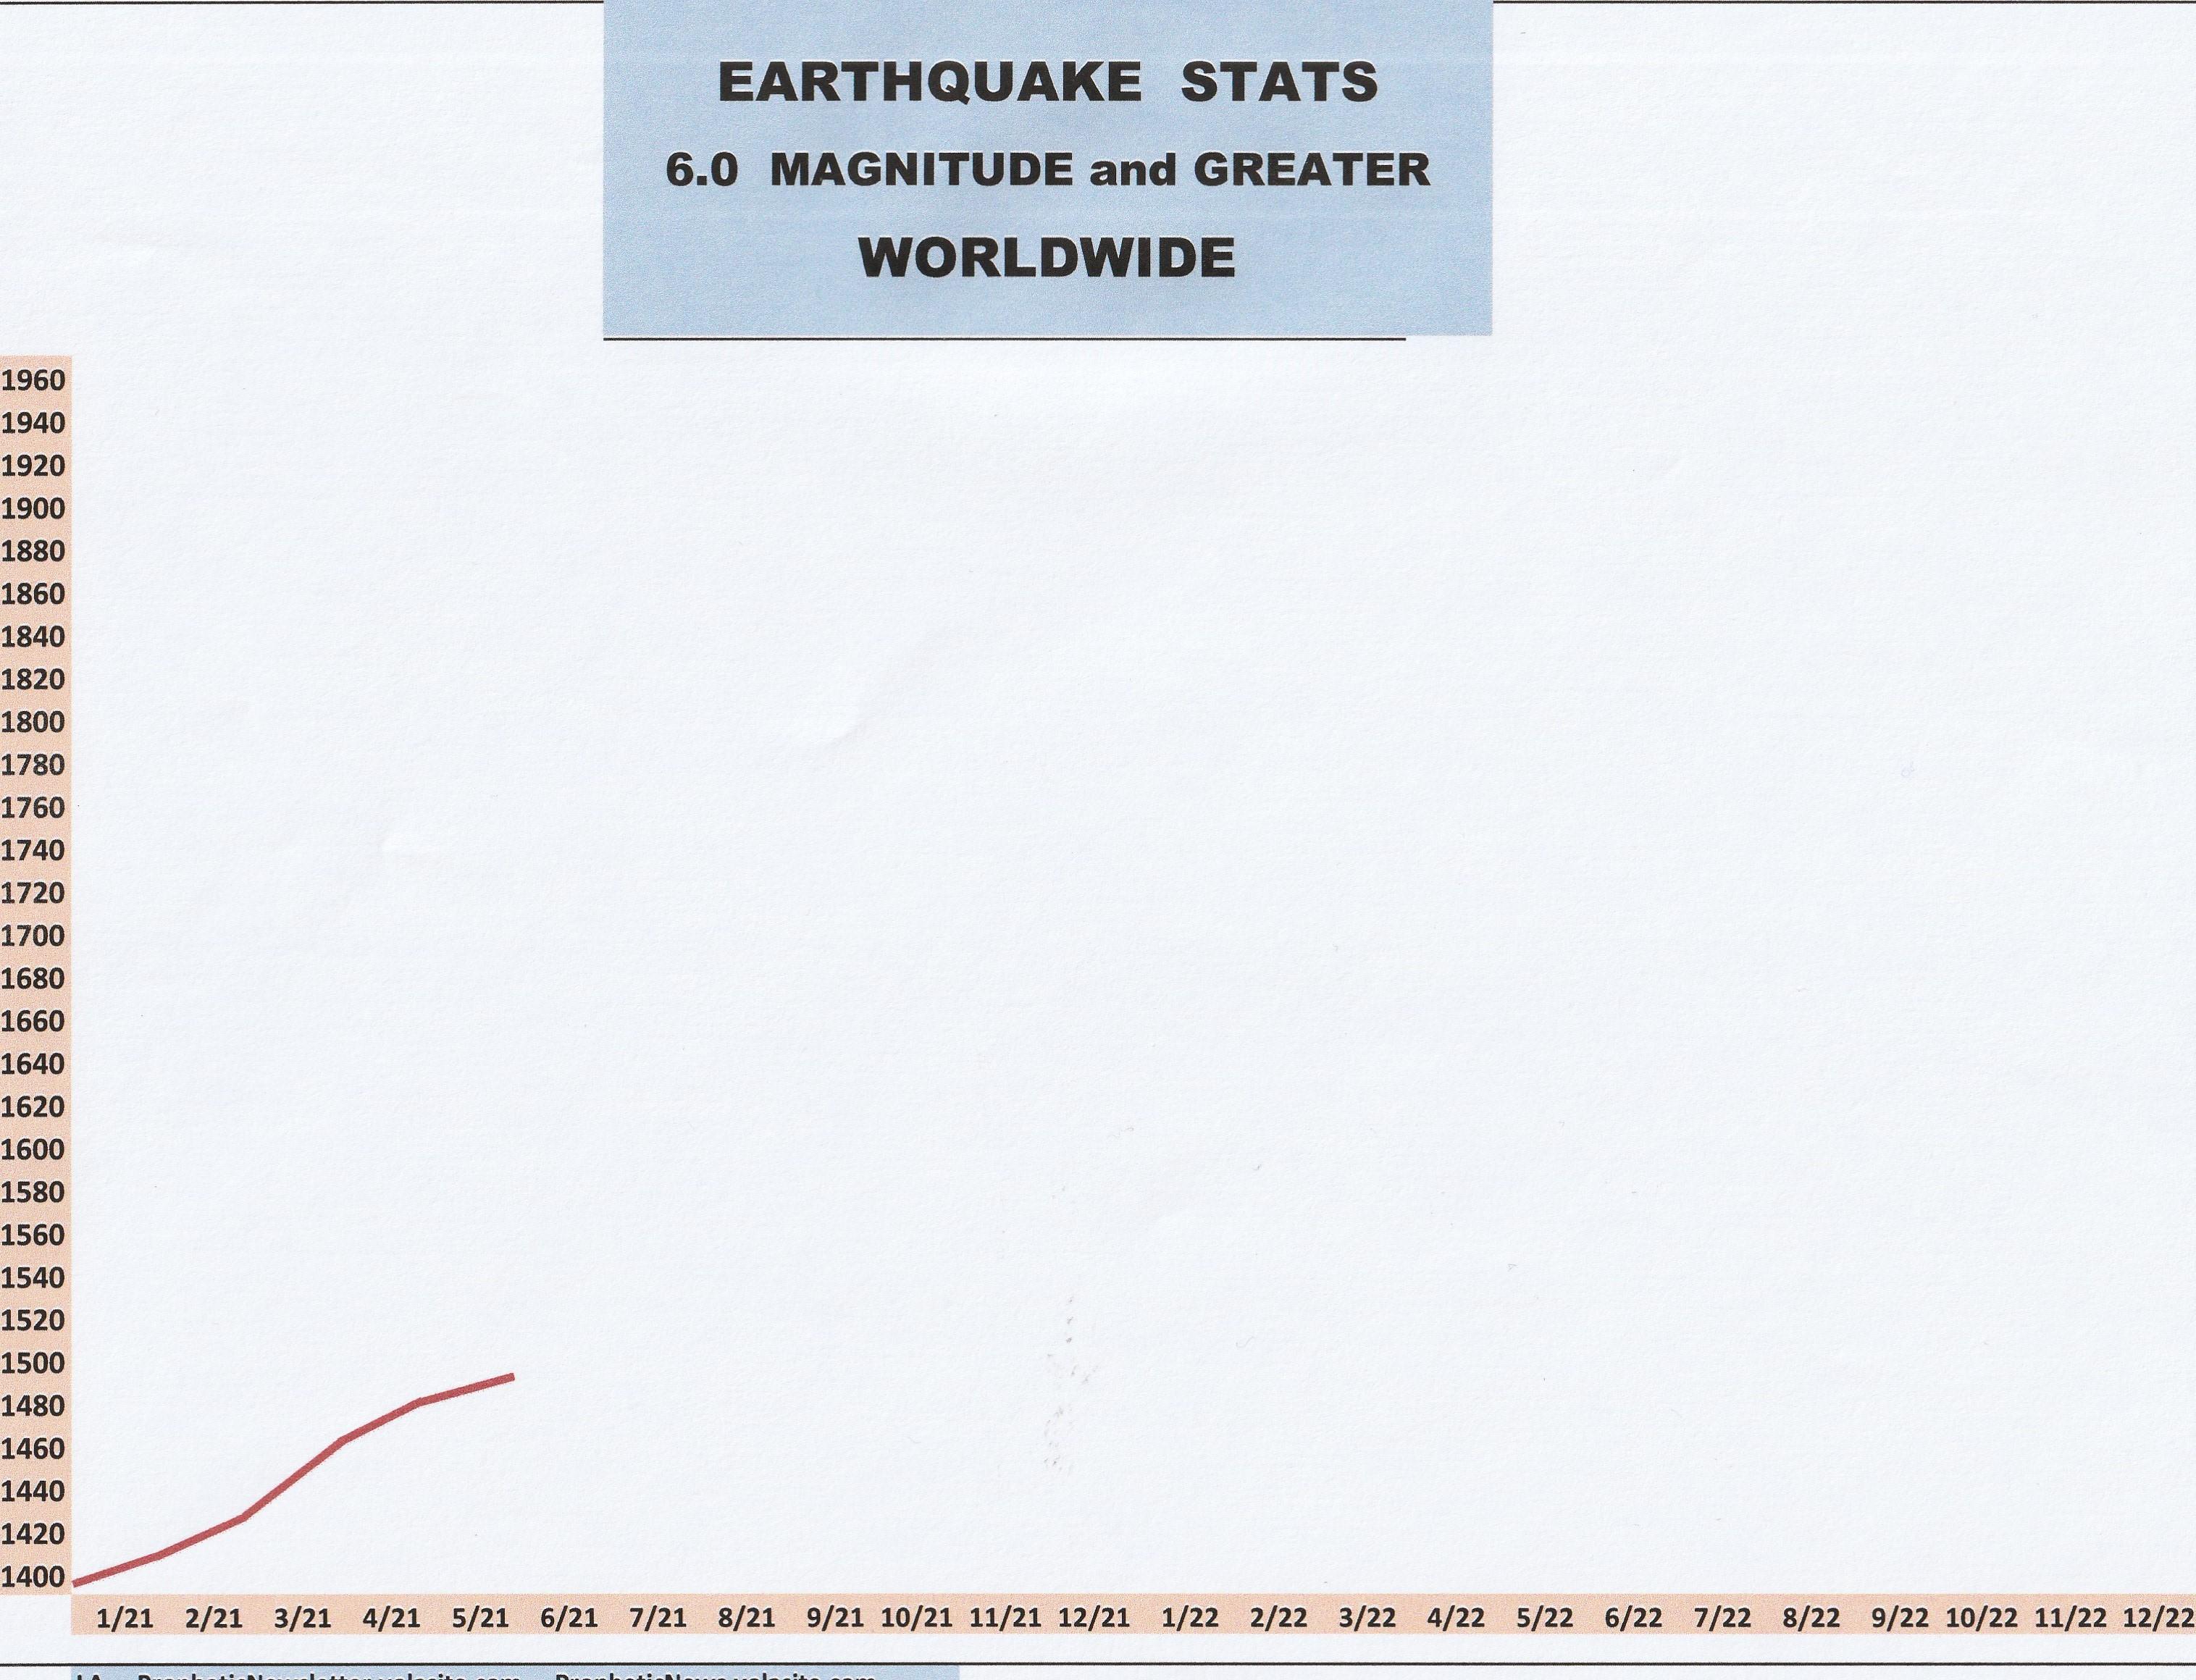 6-21 EARTHQUAKE STATS